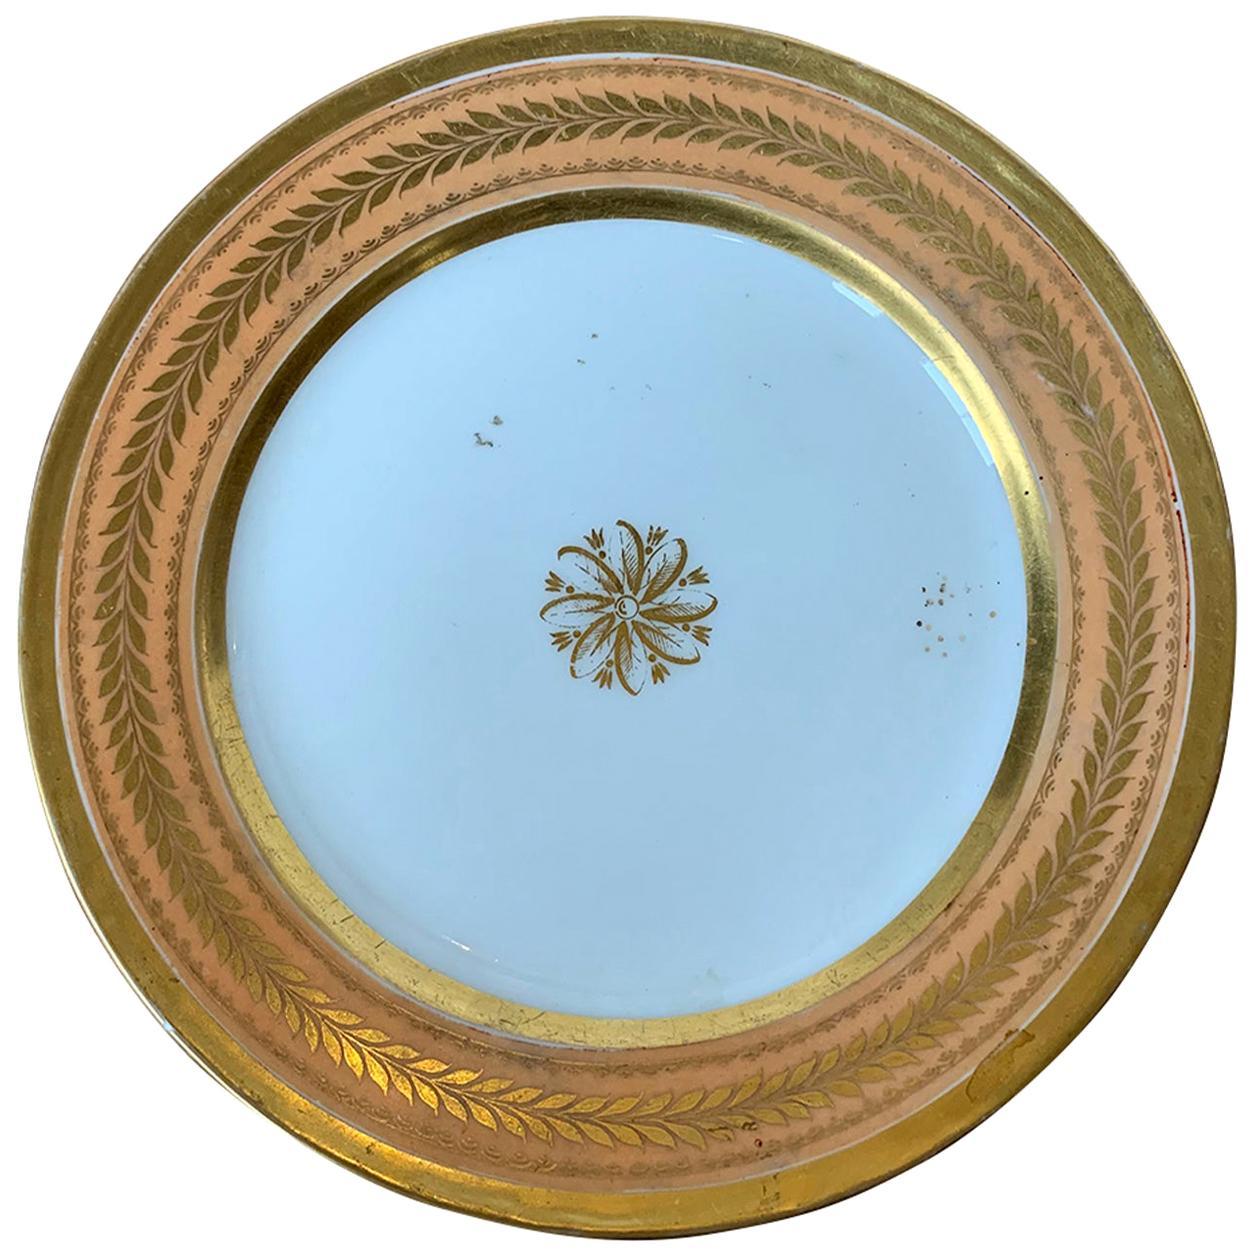 19th Century Continental Porcelain Plate, Gilt Details, Faint X-Impressed Mark